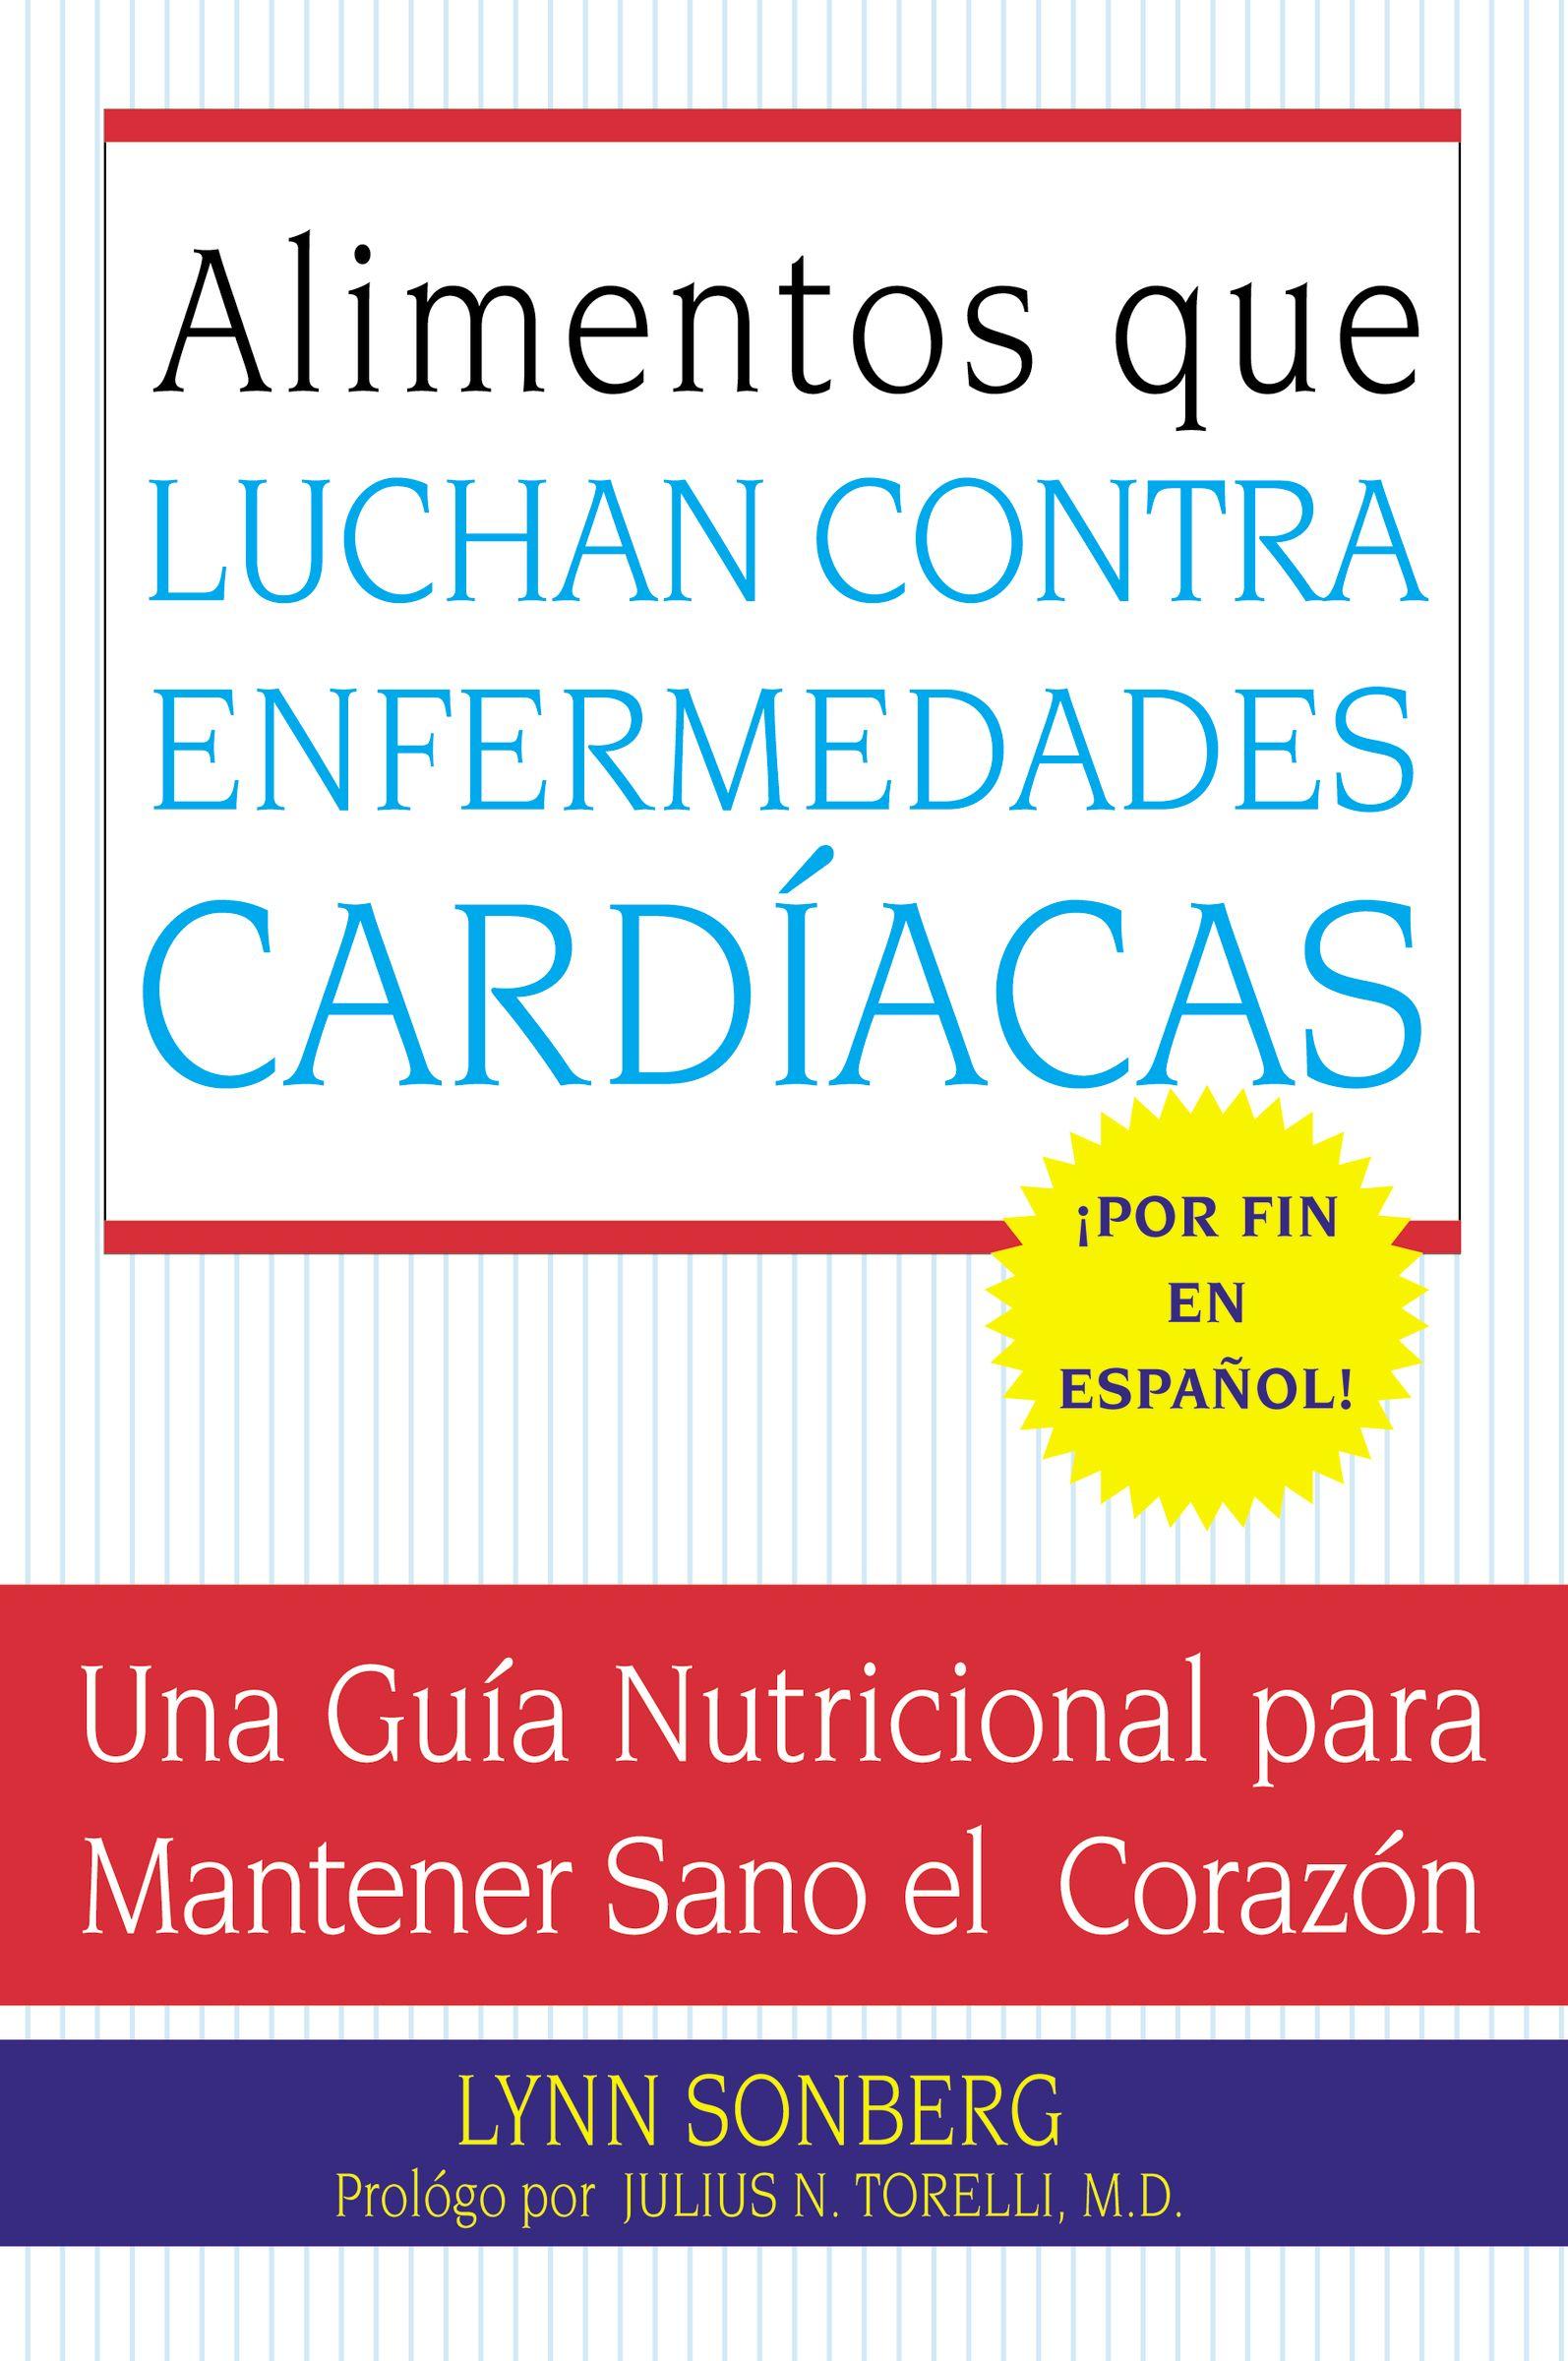 Alimentos que Luchan Contra las Enfermedades Cardiacas